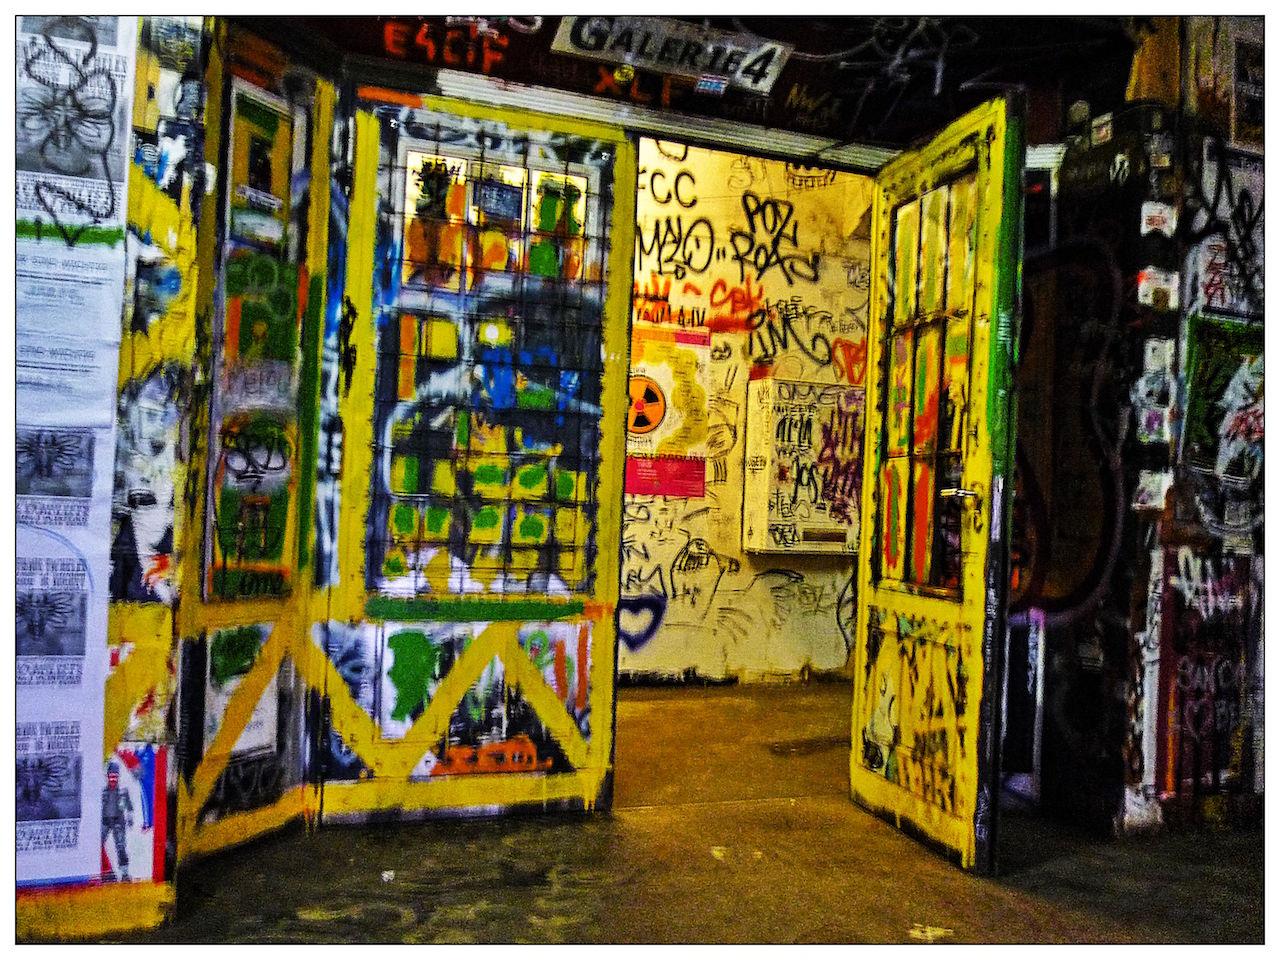 Galerie 4, Berlin © Jean-Philippe Cazier